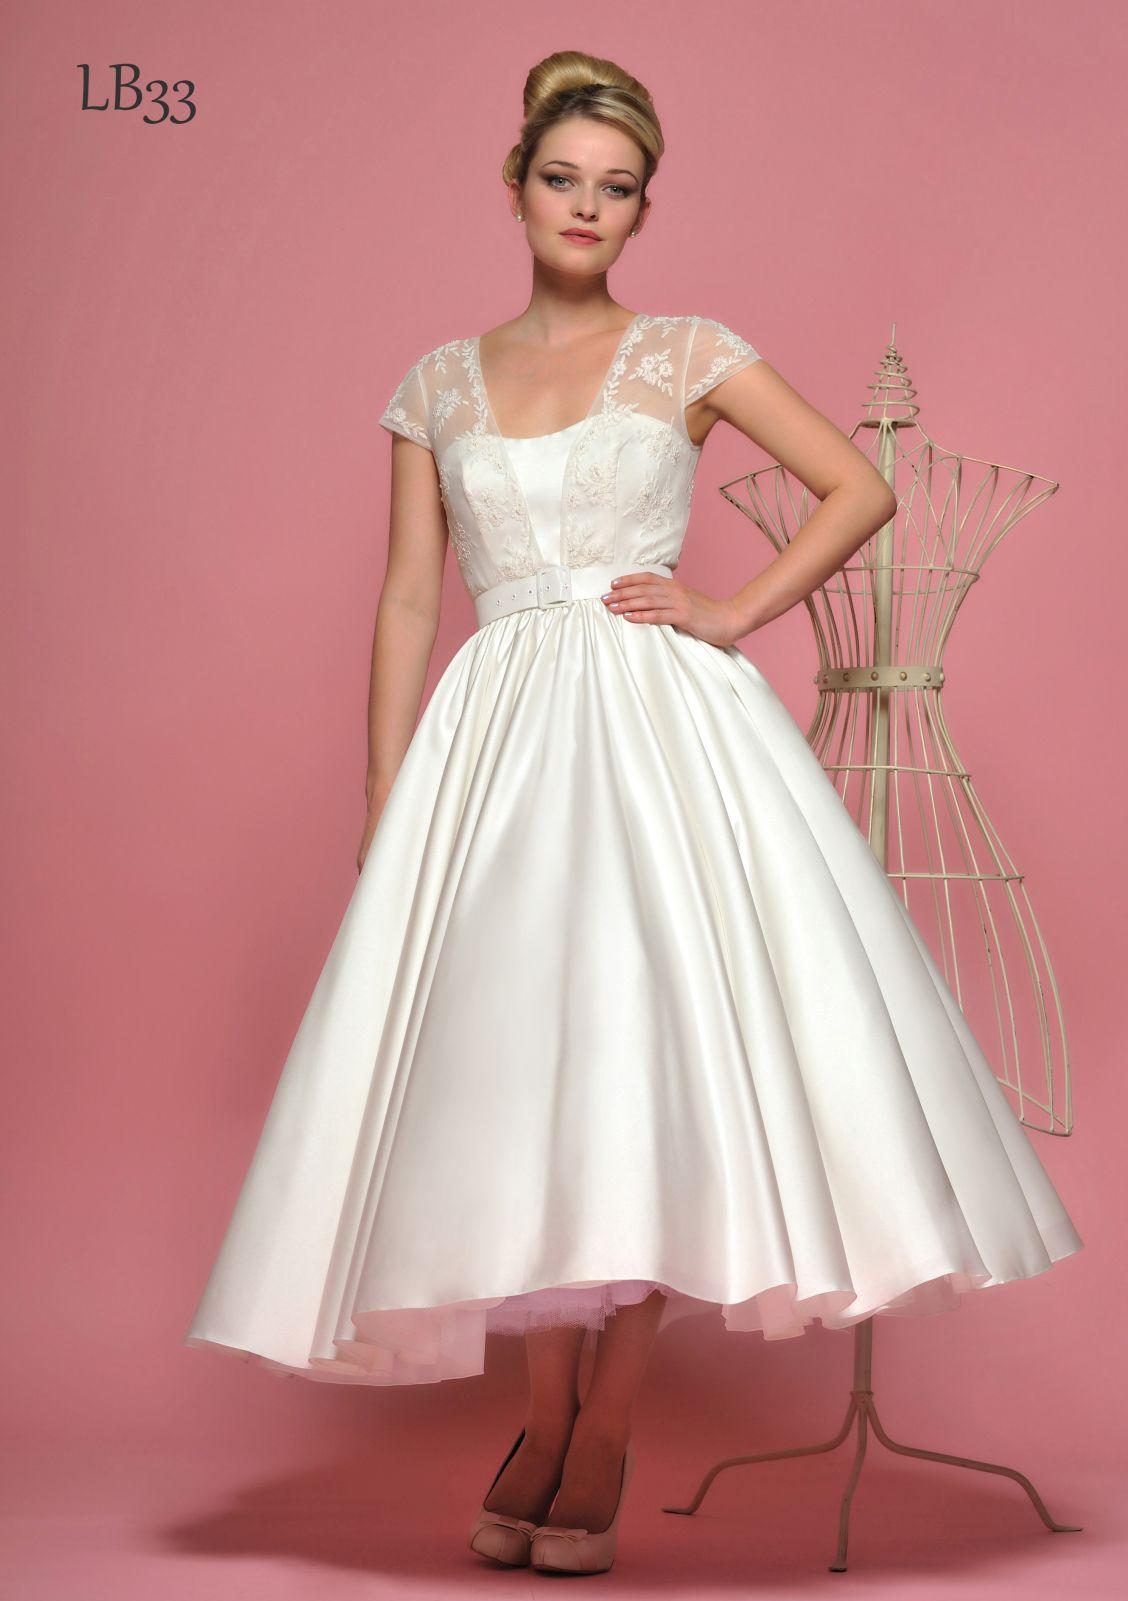 Lou Lou Bridal Dress. www.emporiumengland.co.uk | wedding dresses ...